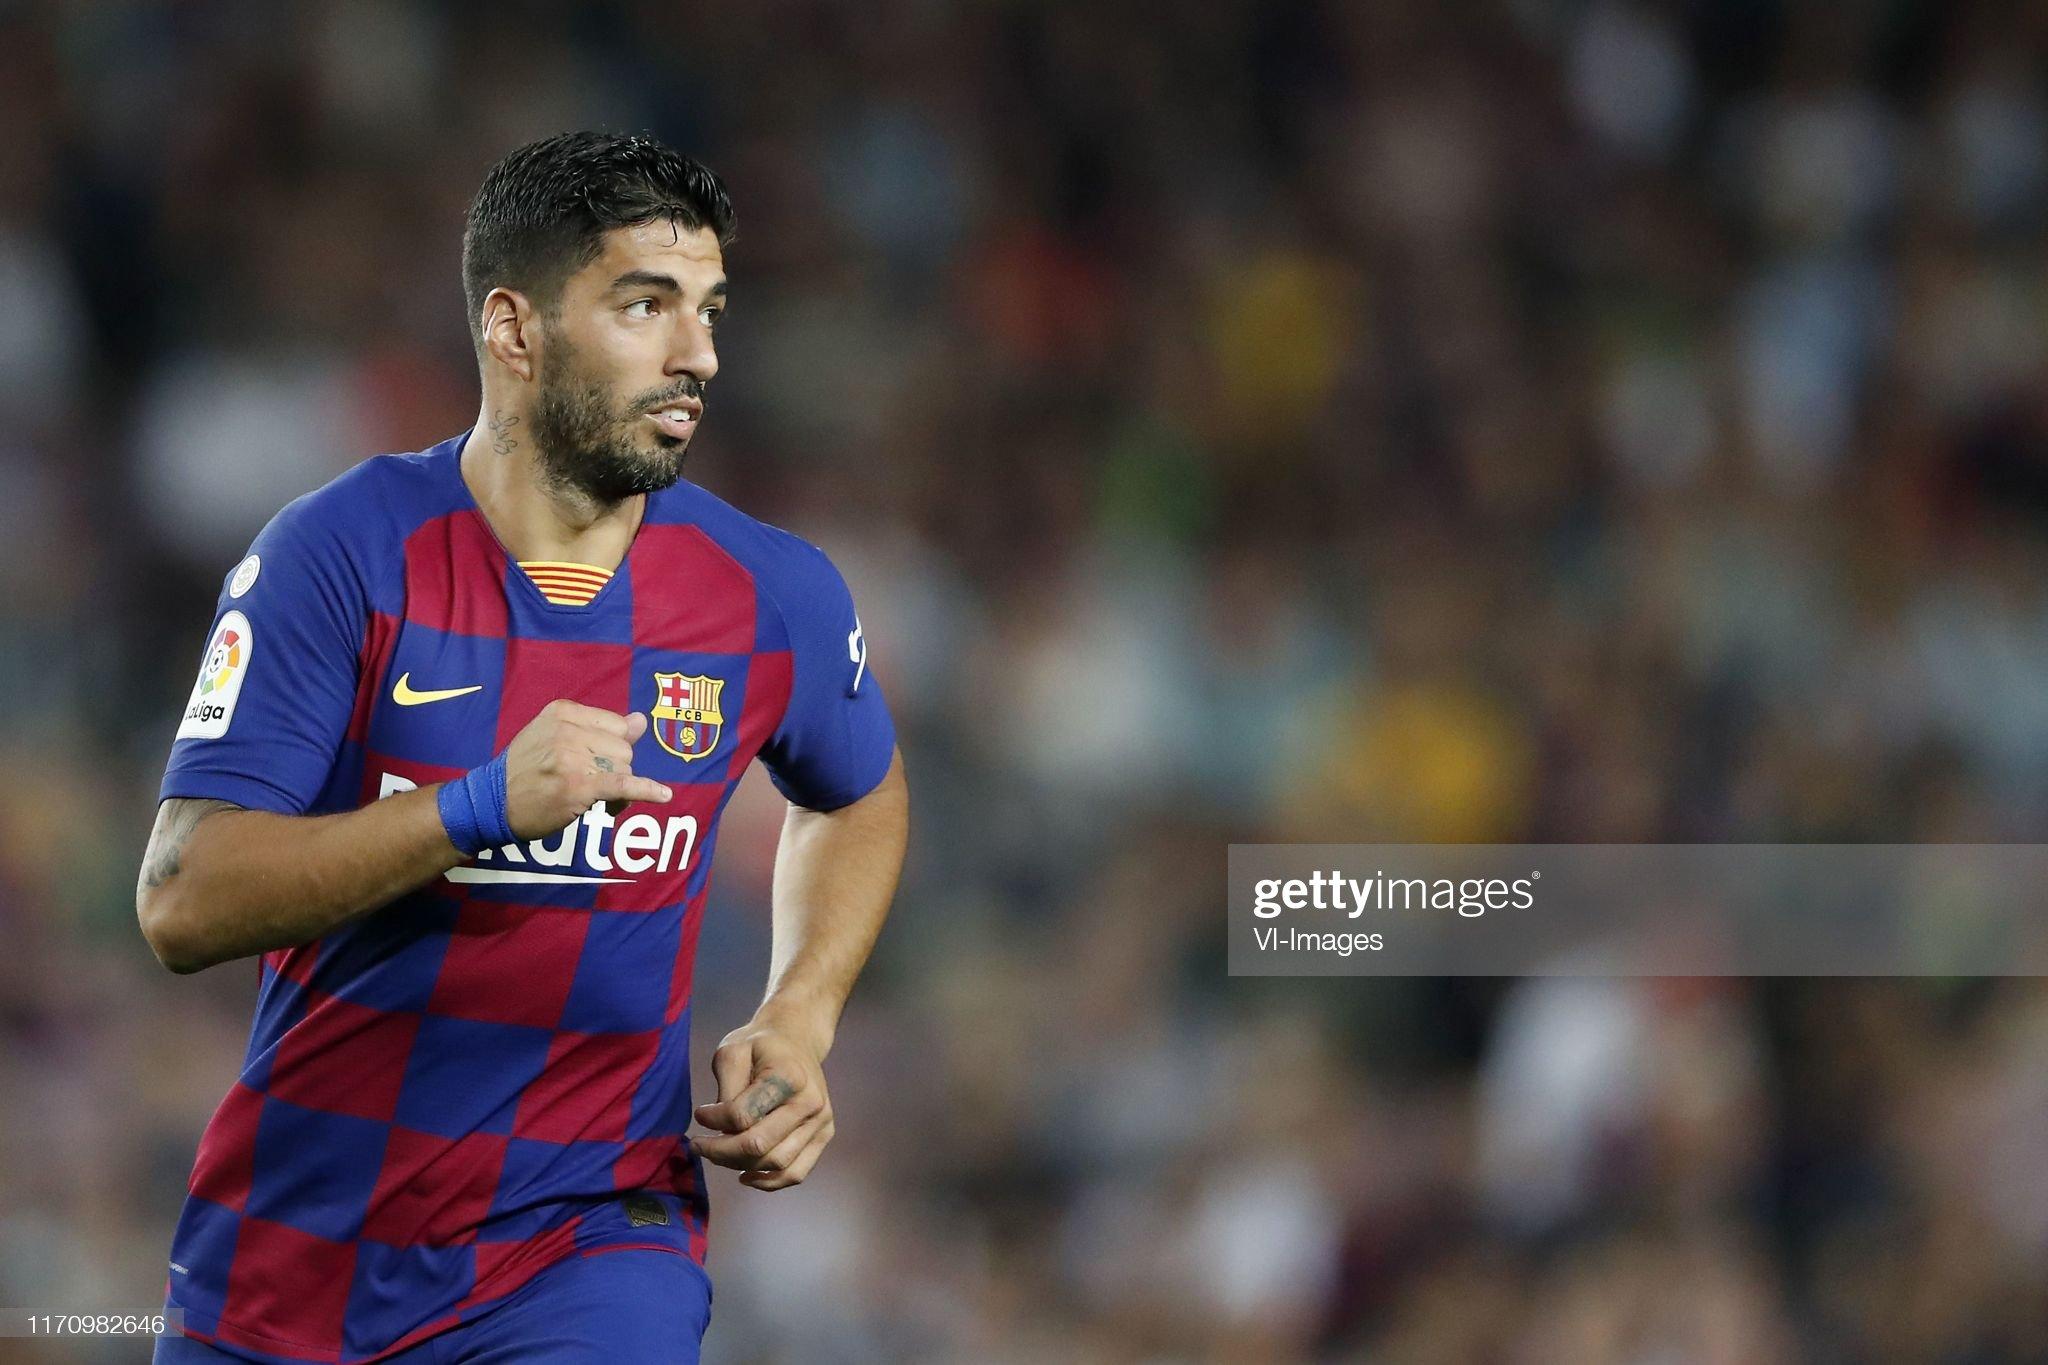 صور مباراة : برشلونة - فياريال 2-1 ( 24-09-2019 )  Luis-suarez-of-fc-barcelona-during-the-laliga-santander-match-between-picture-id1170982646?s=2048x2048